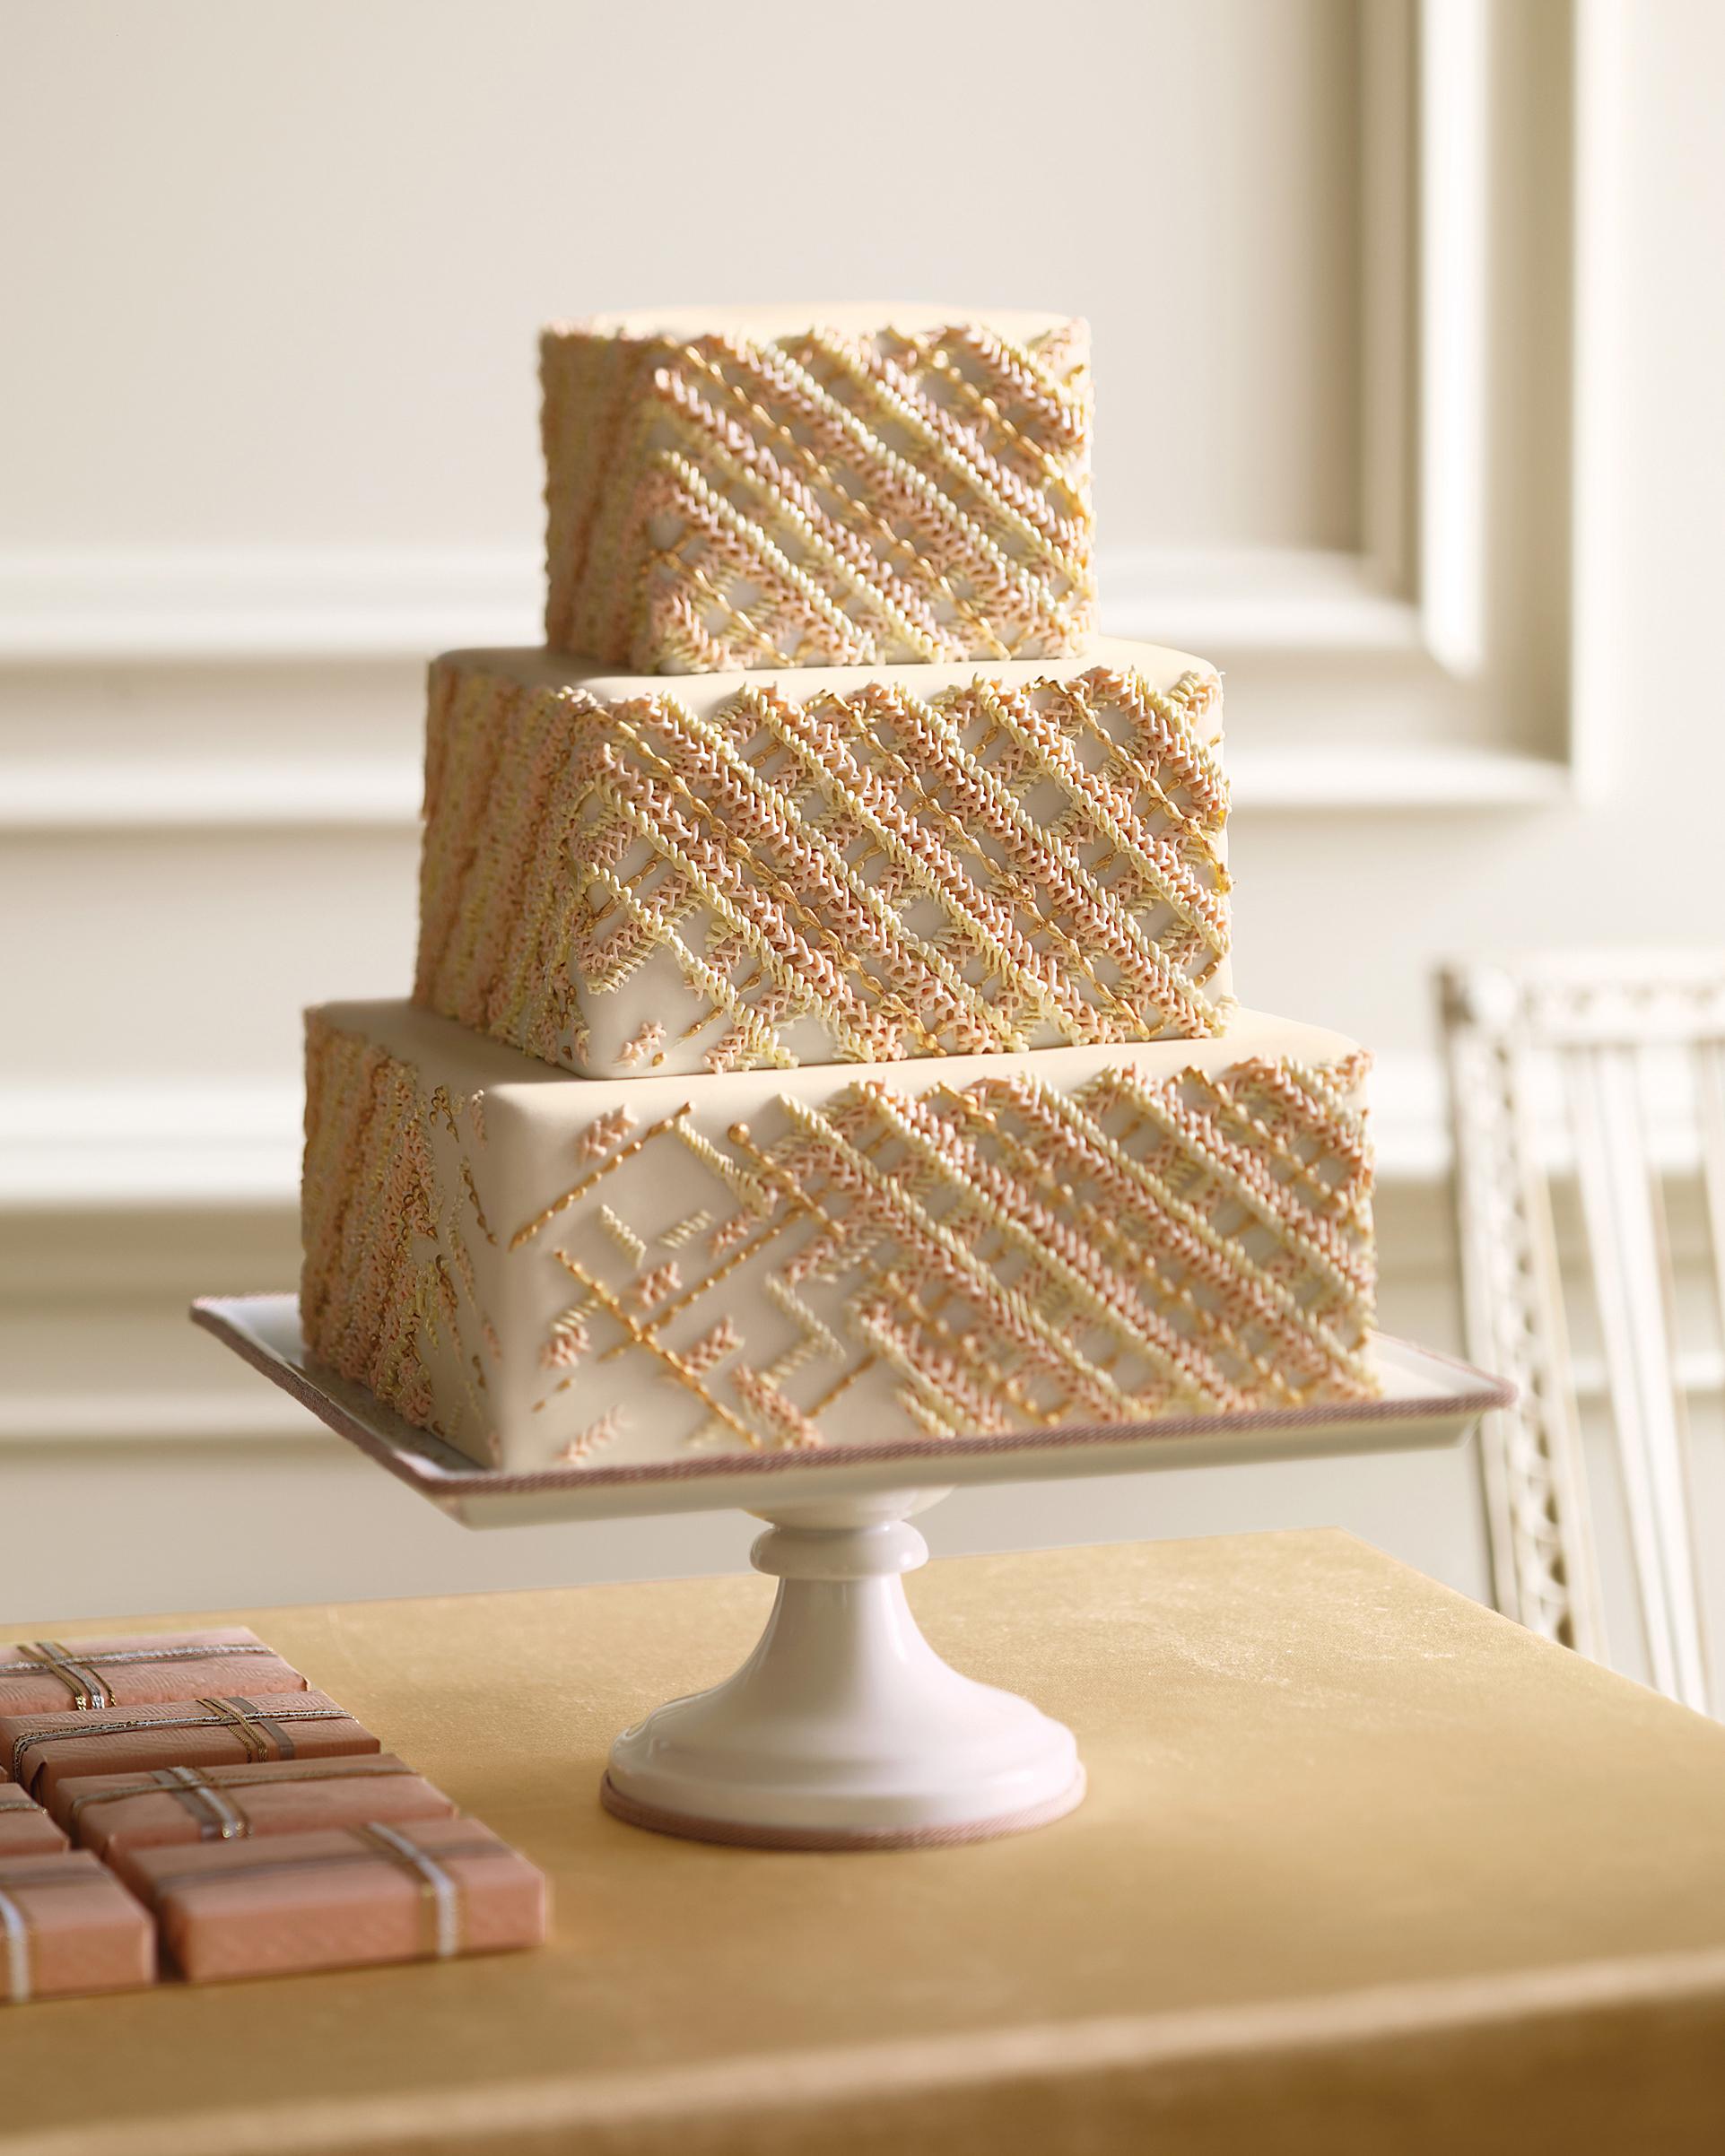 cake-7-0811mwd107413.jpg